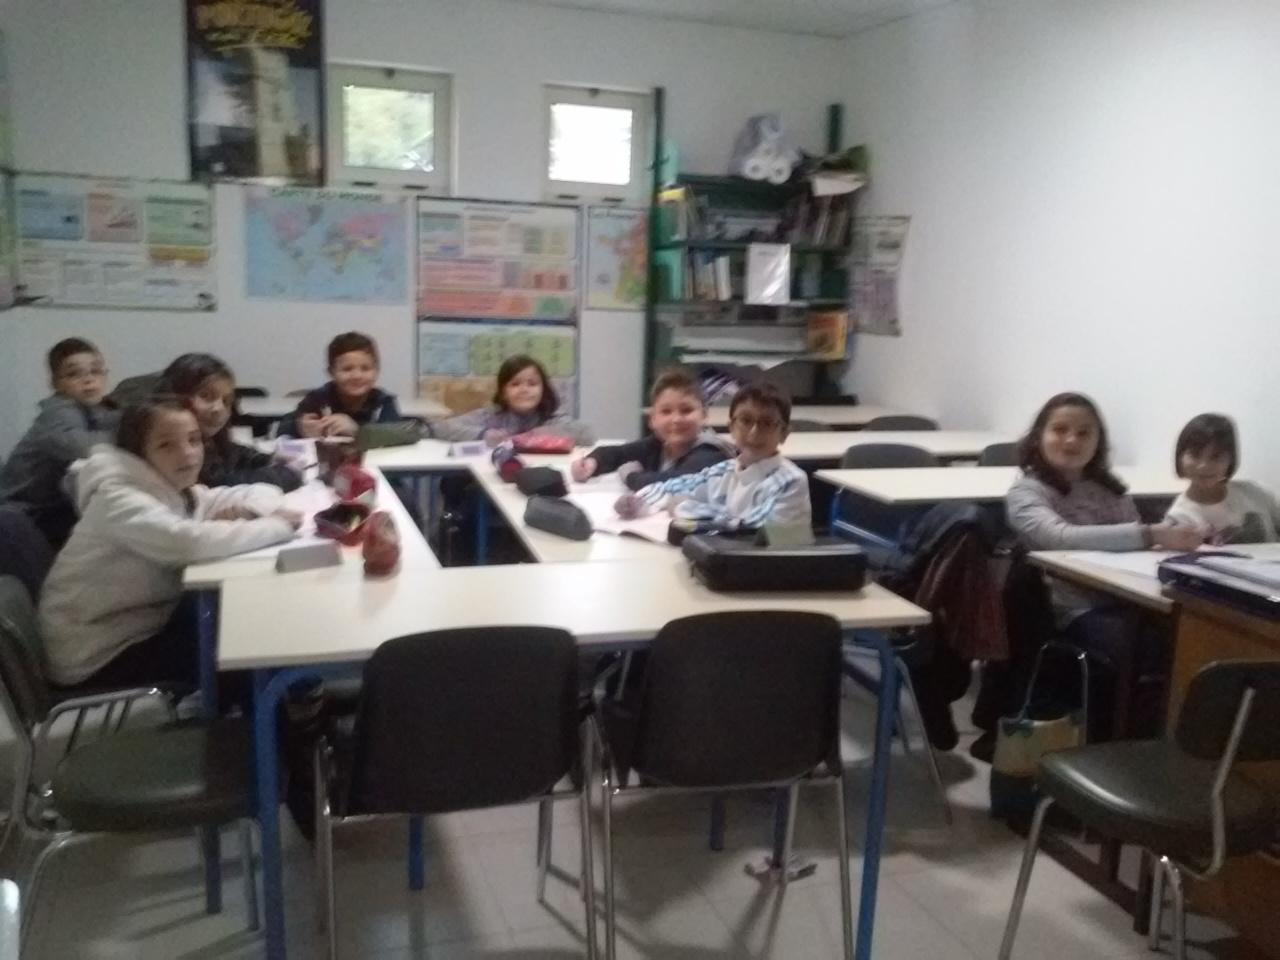 les diff u00e9rents moyens pour apprendre  u00e0 parler portugais  u2013 cours de portugais et portugais